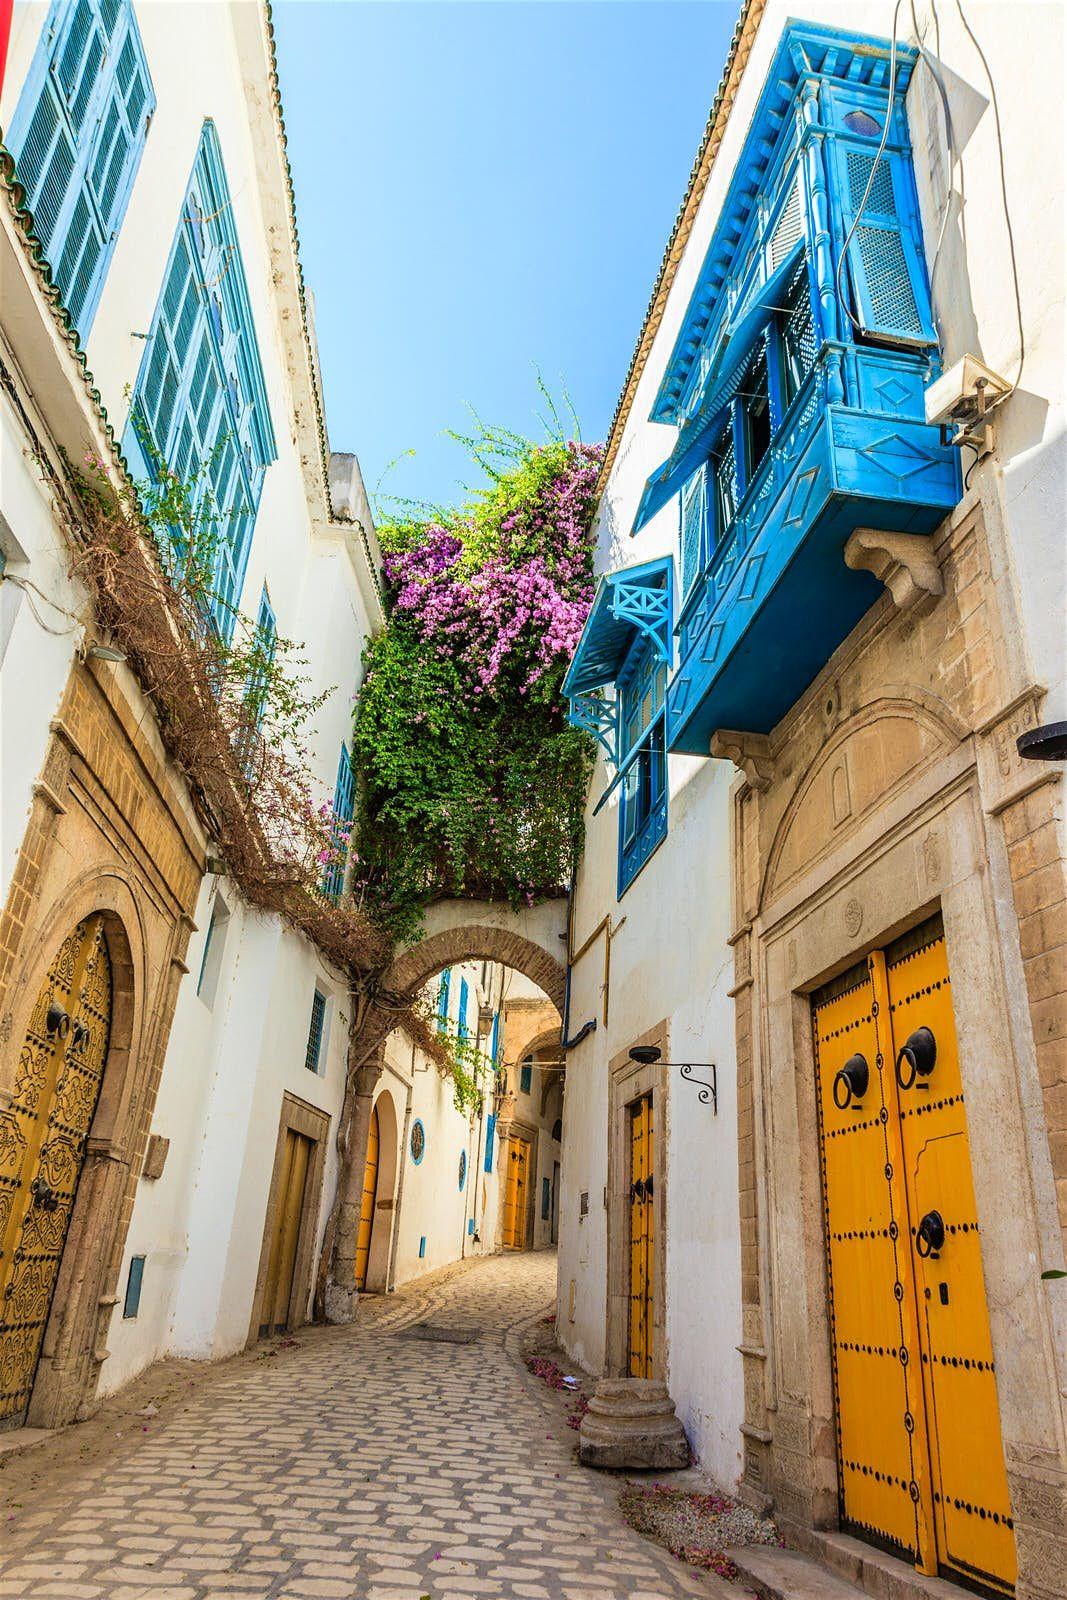 How To Live Like A Local In Tunis Tunisia Tunisia Tunis Tunisia Africa